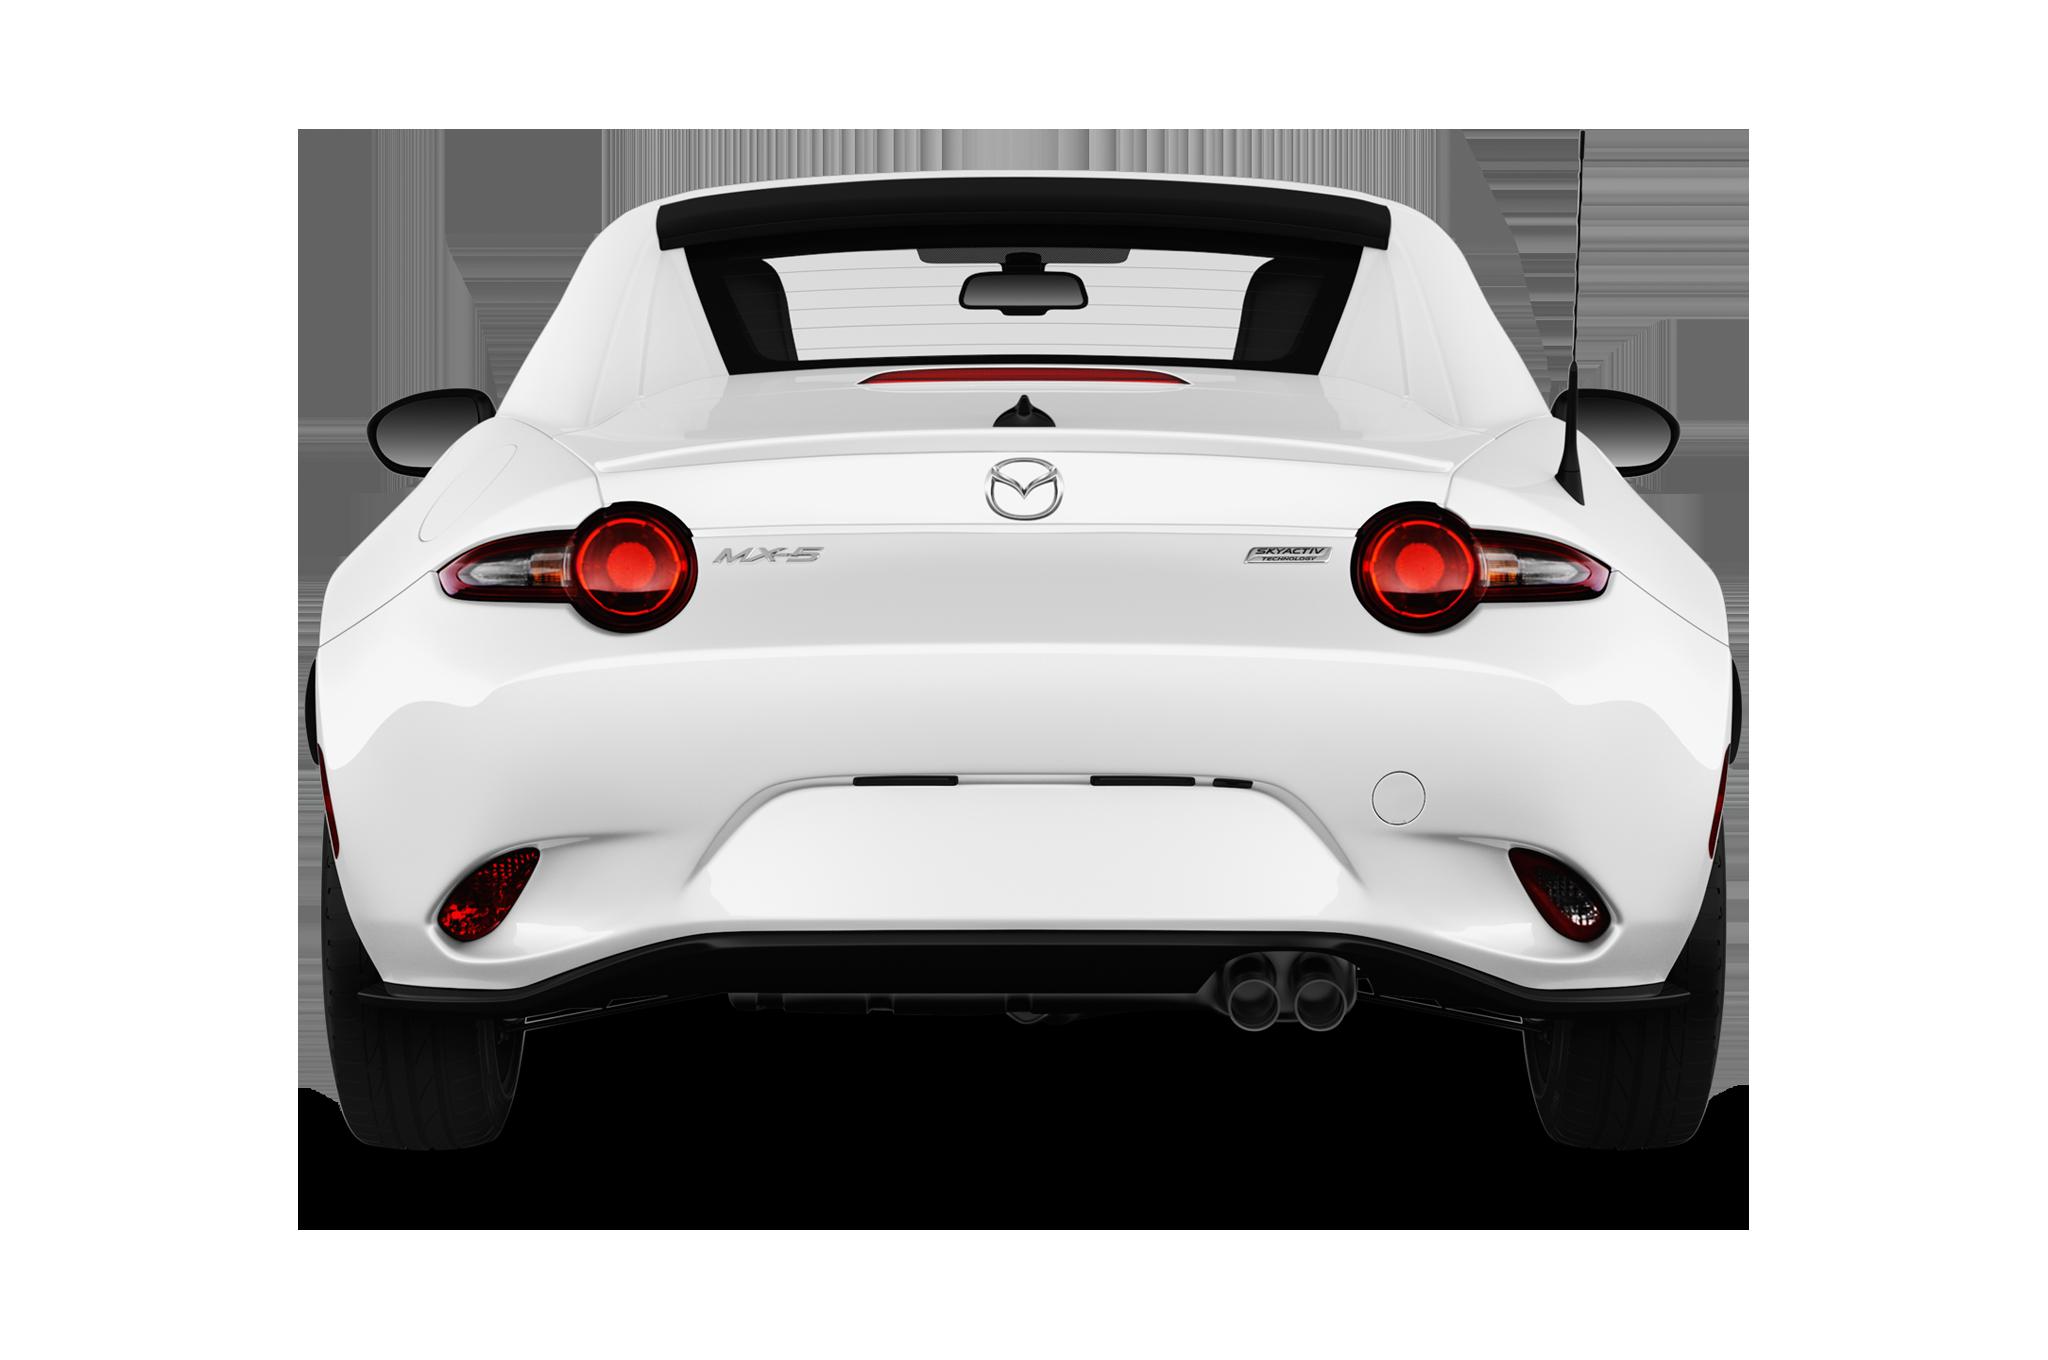 2017 Mazda MX-5 Miata RF First Drive Review